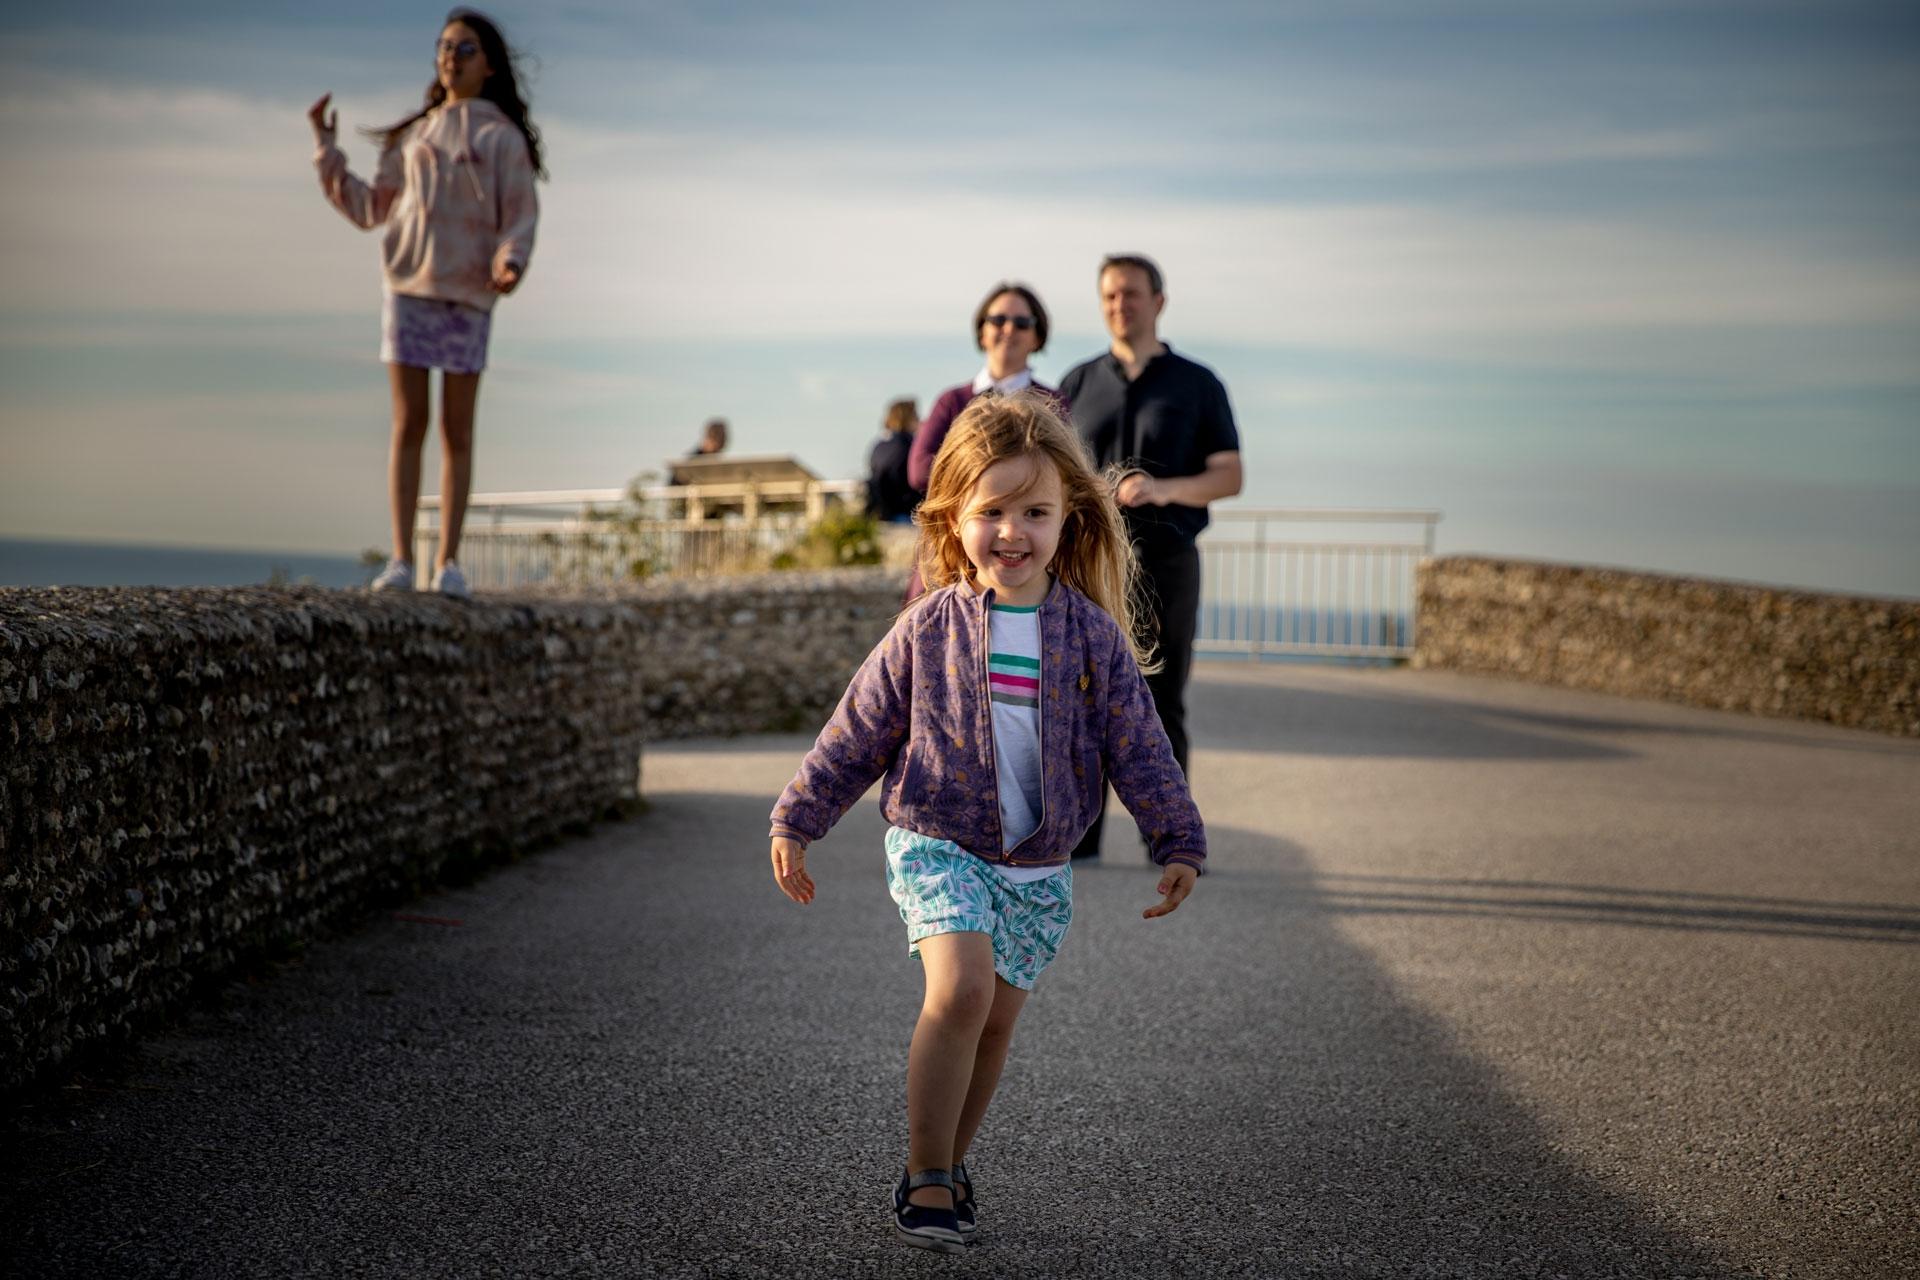 particuliers-portraits-famille-chauveau-mary-2020-010